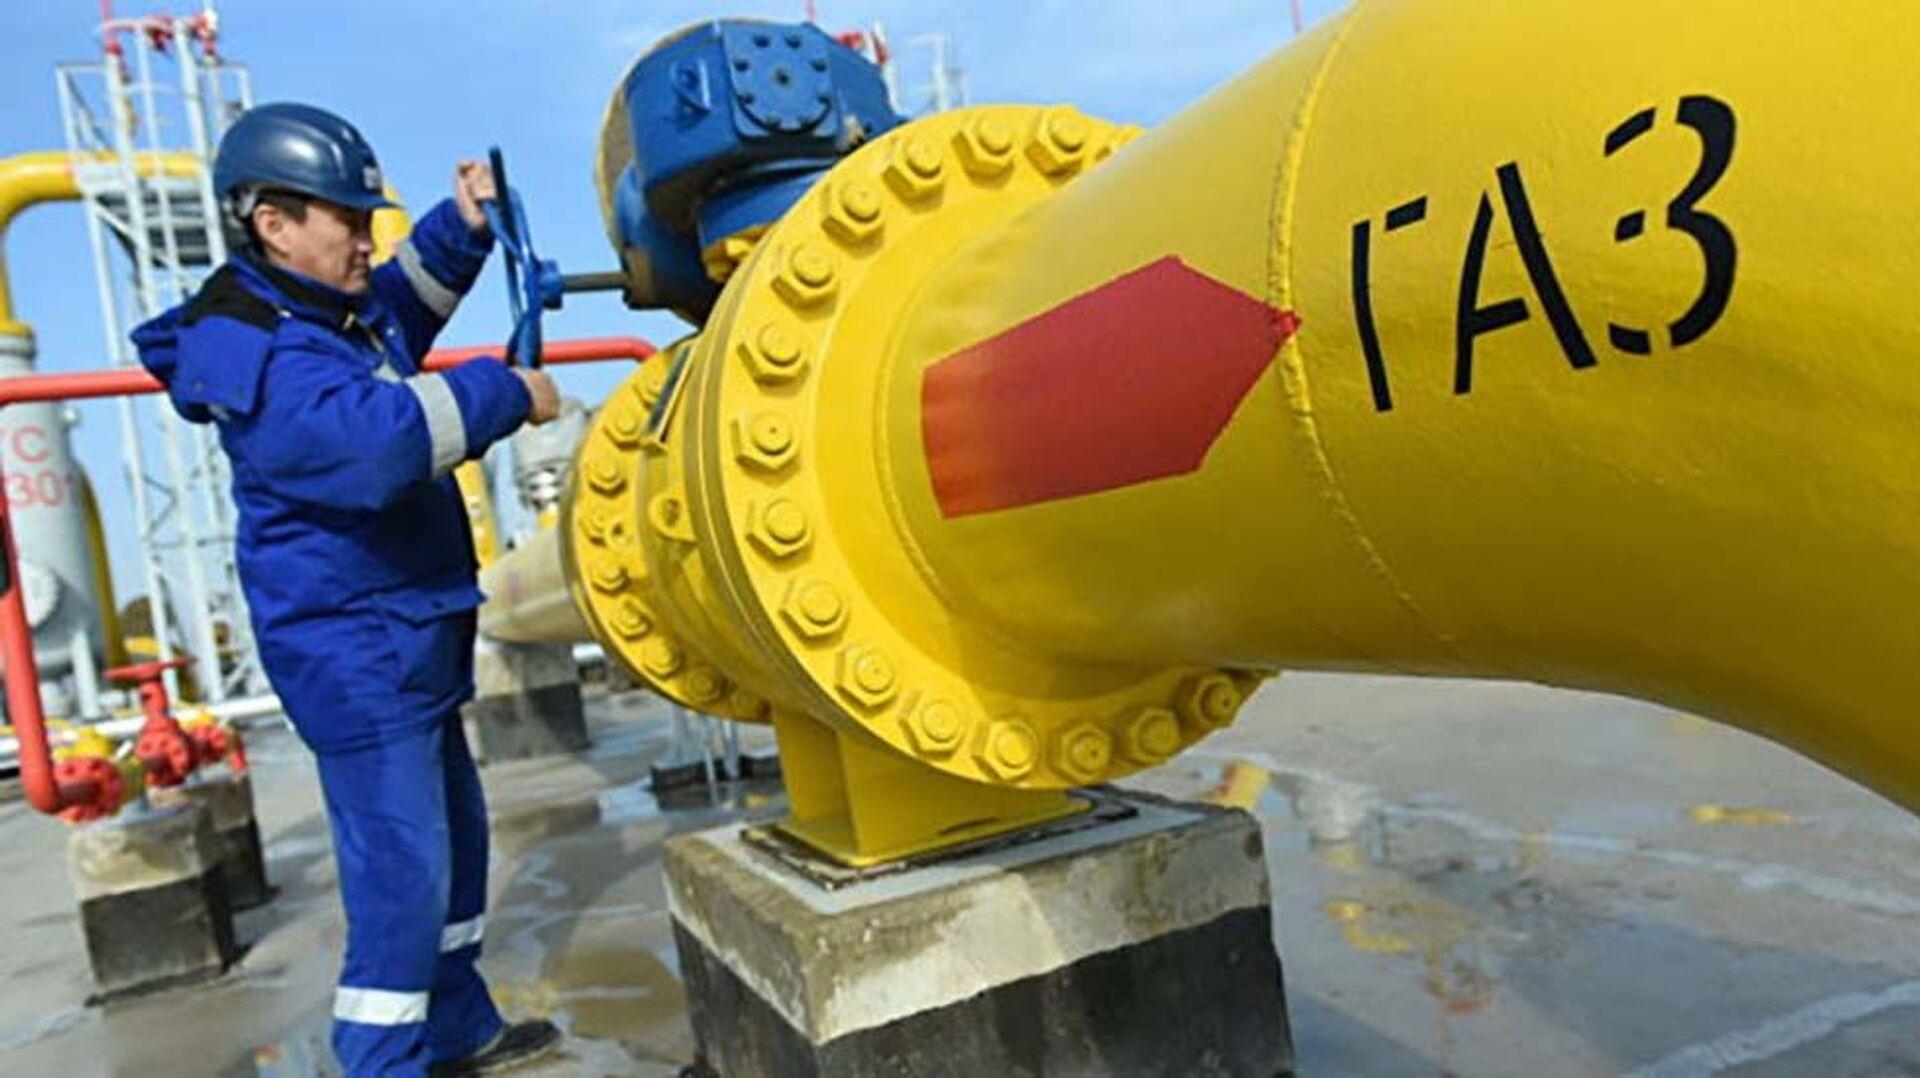 "Последнее звено трансазиатского газопровода ""Центральная Азия - Китай"" запущено в Казахстане - Sputnik Таджикистан, 1920, 30.09.2021"